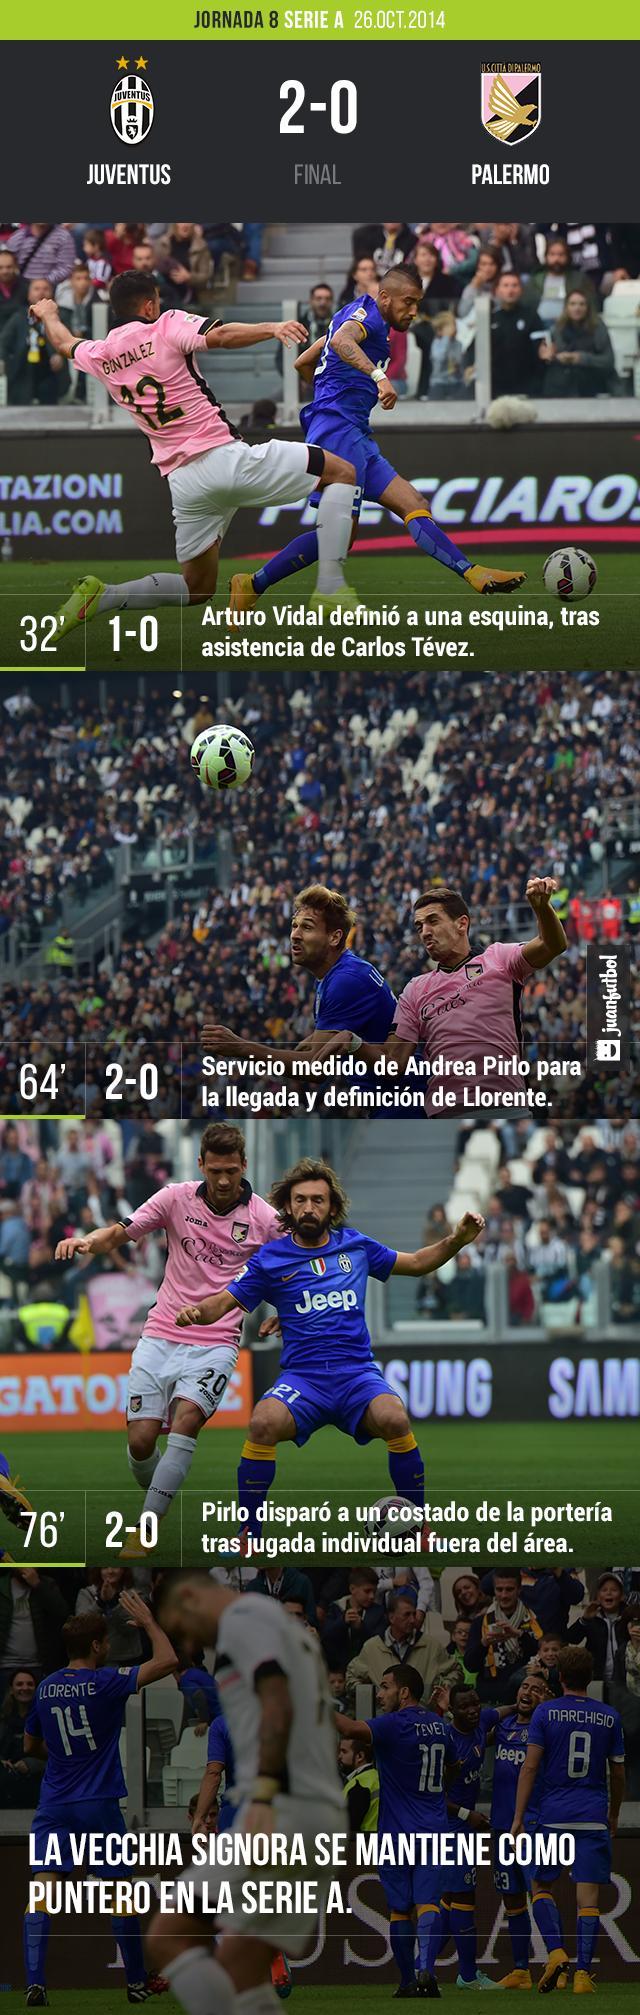 Juventus vs. Palermo